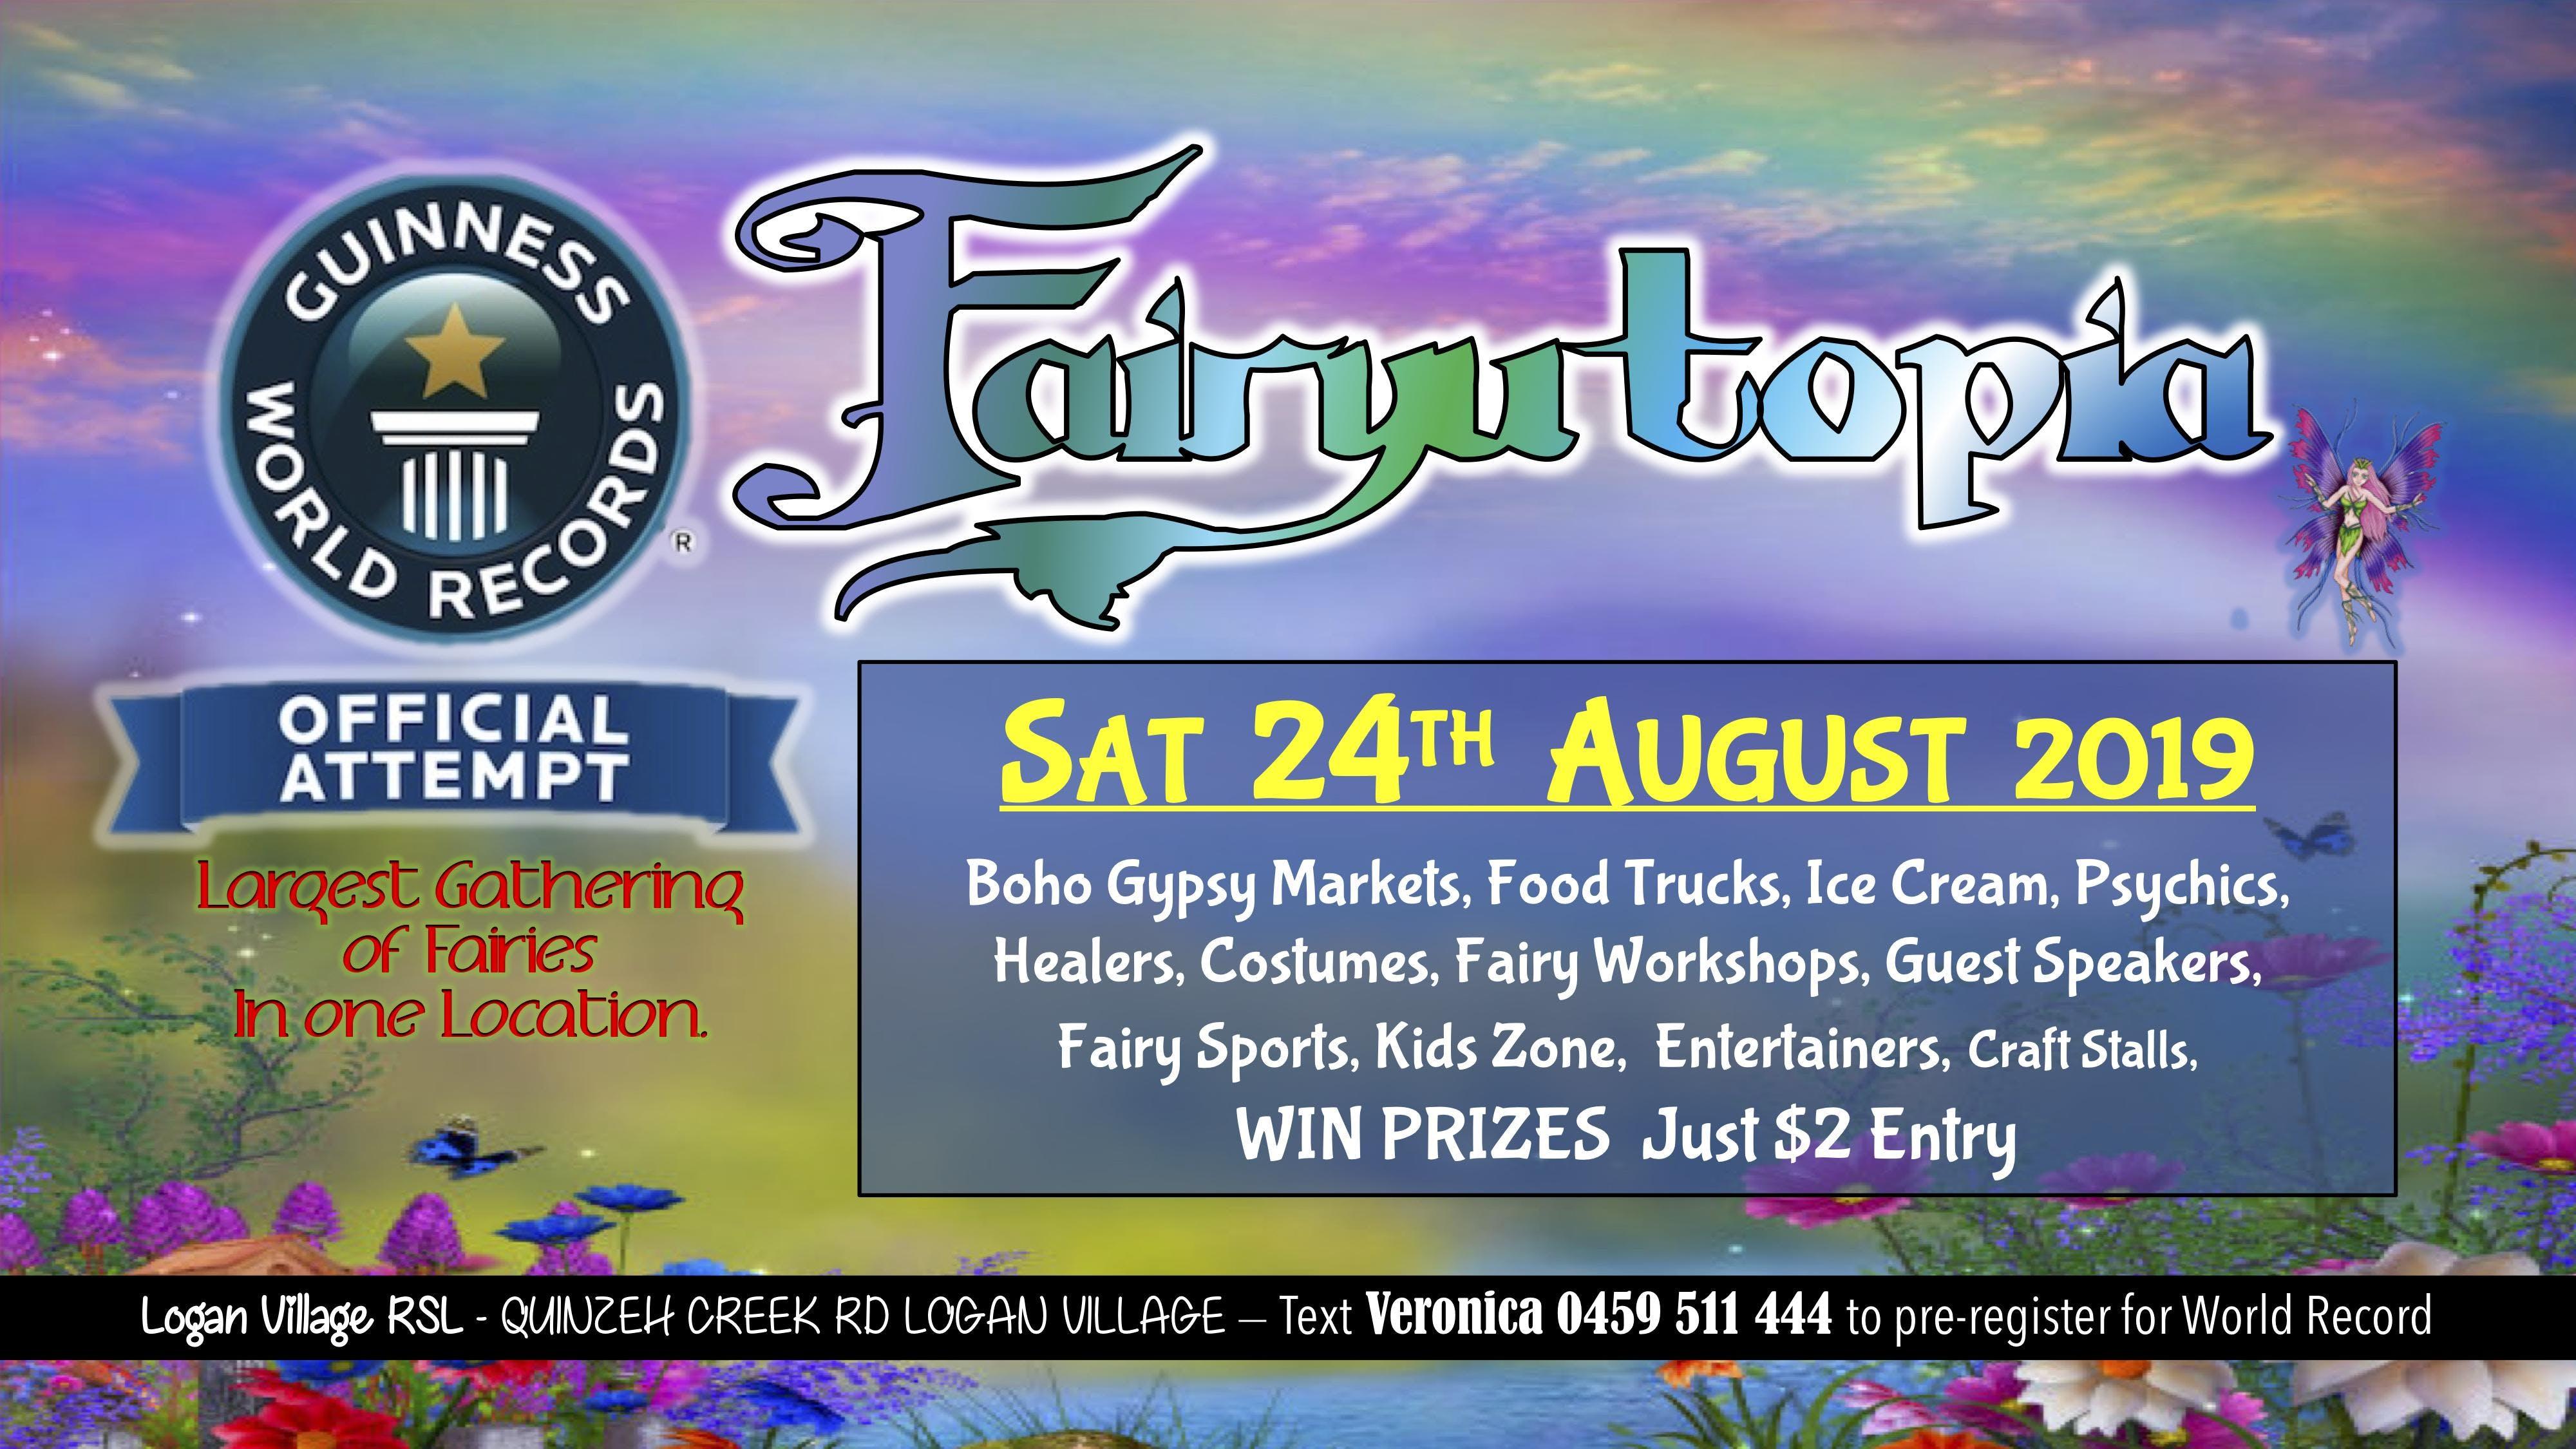 Fairyutopia Guinness World Record Attempt Registration